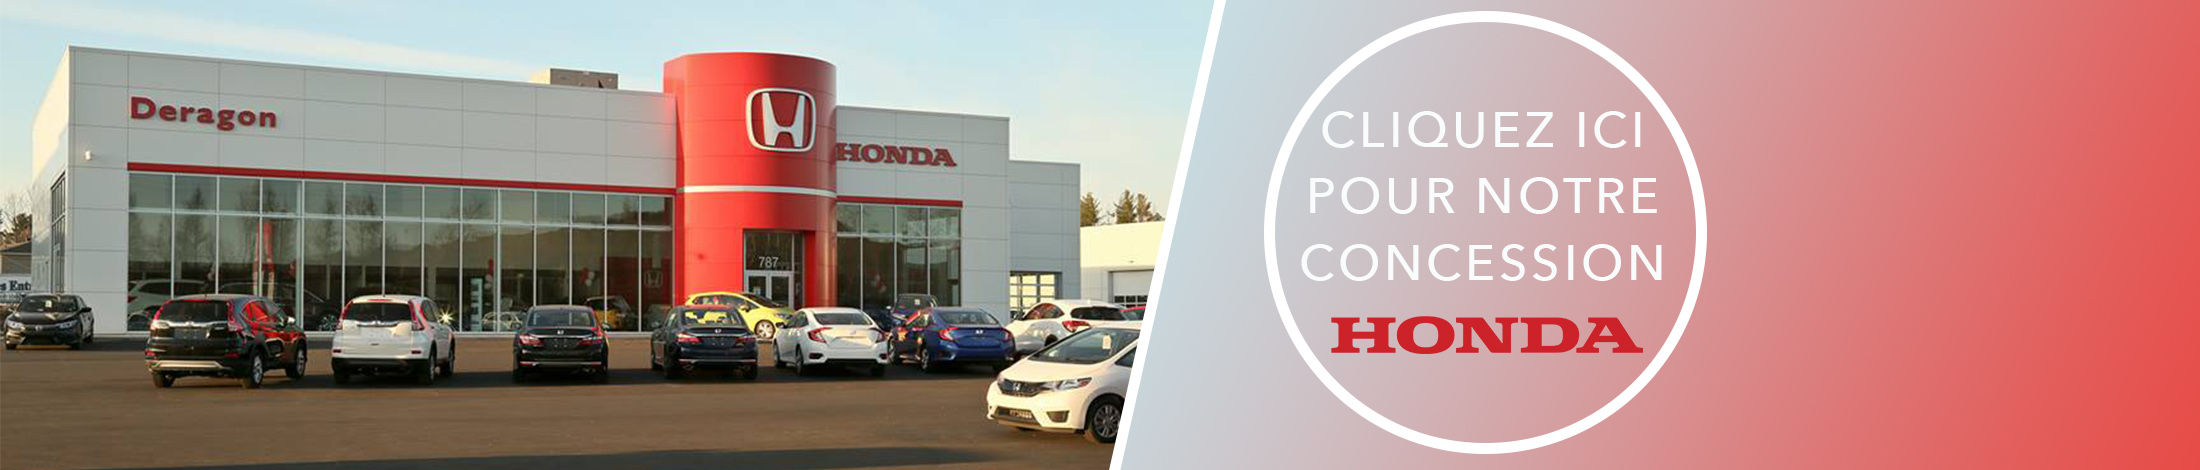 Notre concession Honda